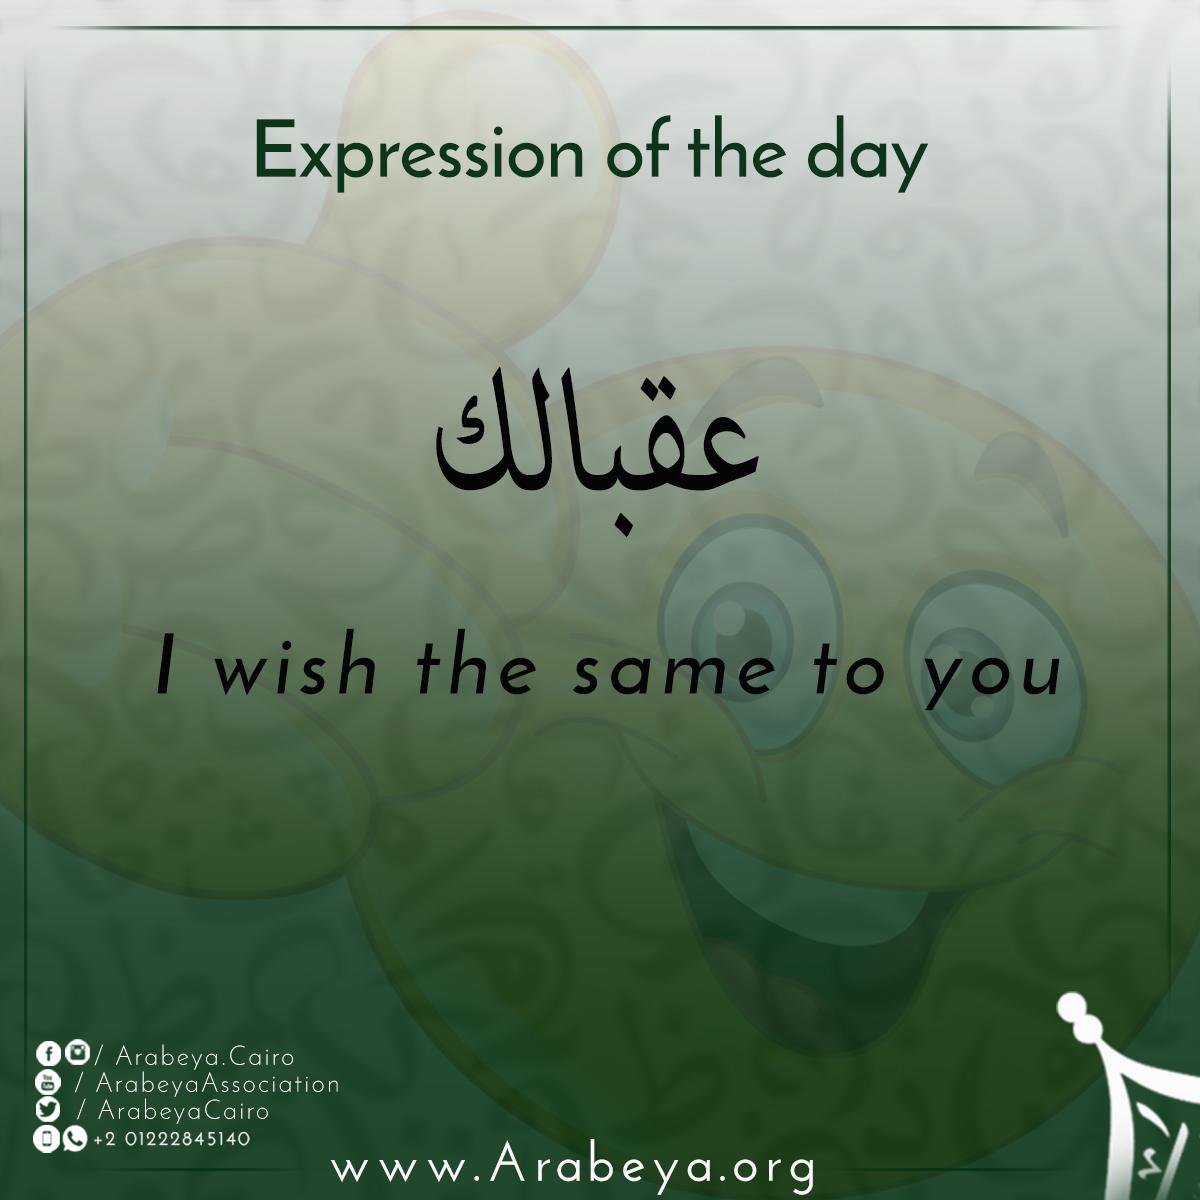 Pin By Shakri On Egyptian Colloquial Arabic 2016 2017 English Language Learning Learn Arabic Language Learn Arabic Online